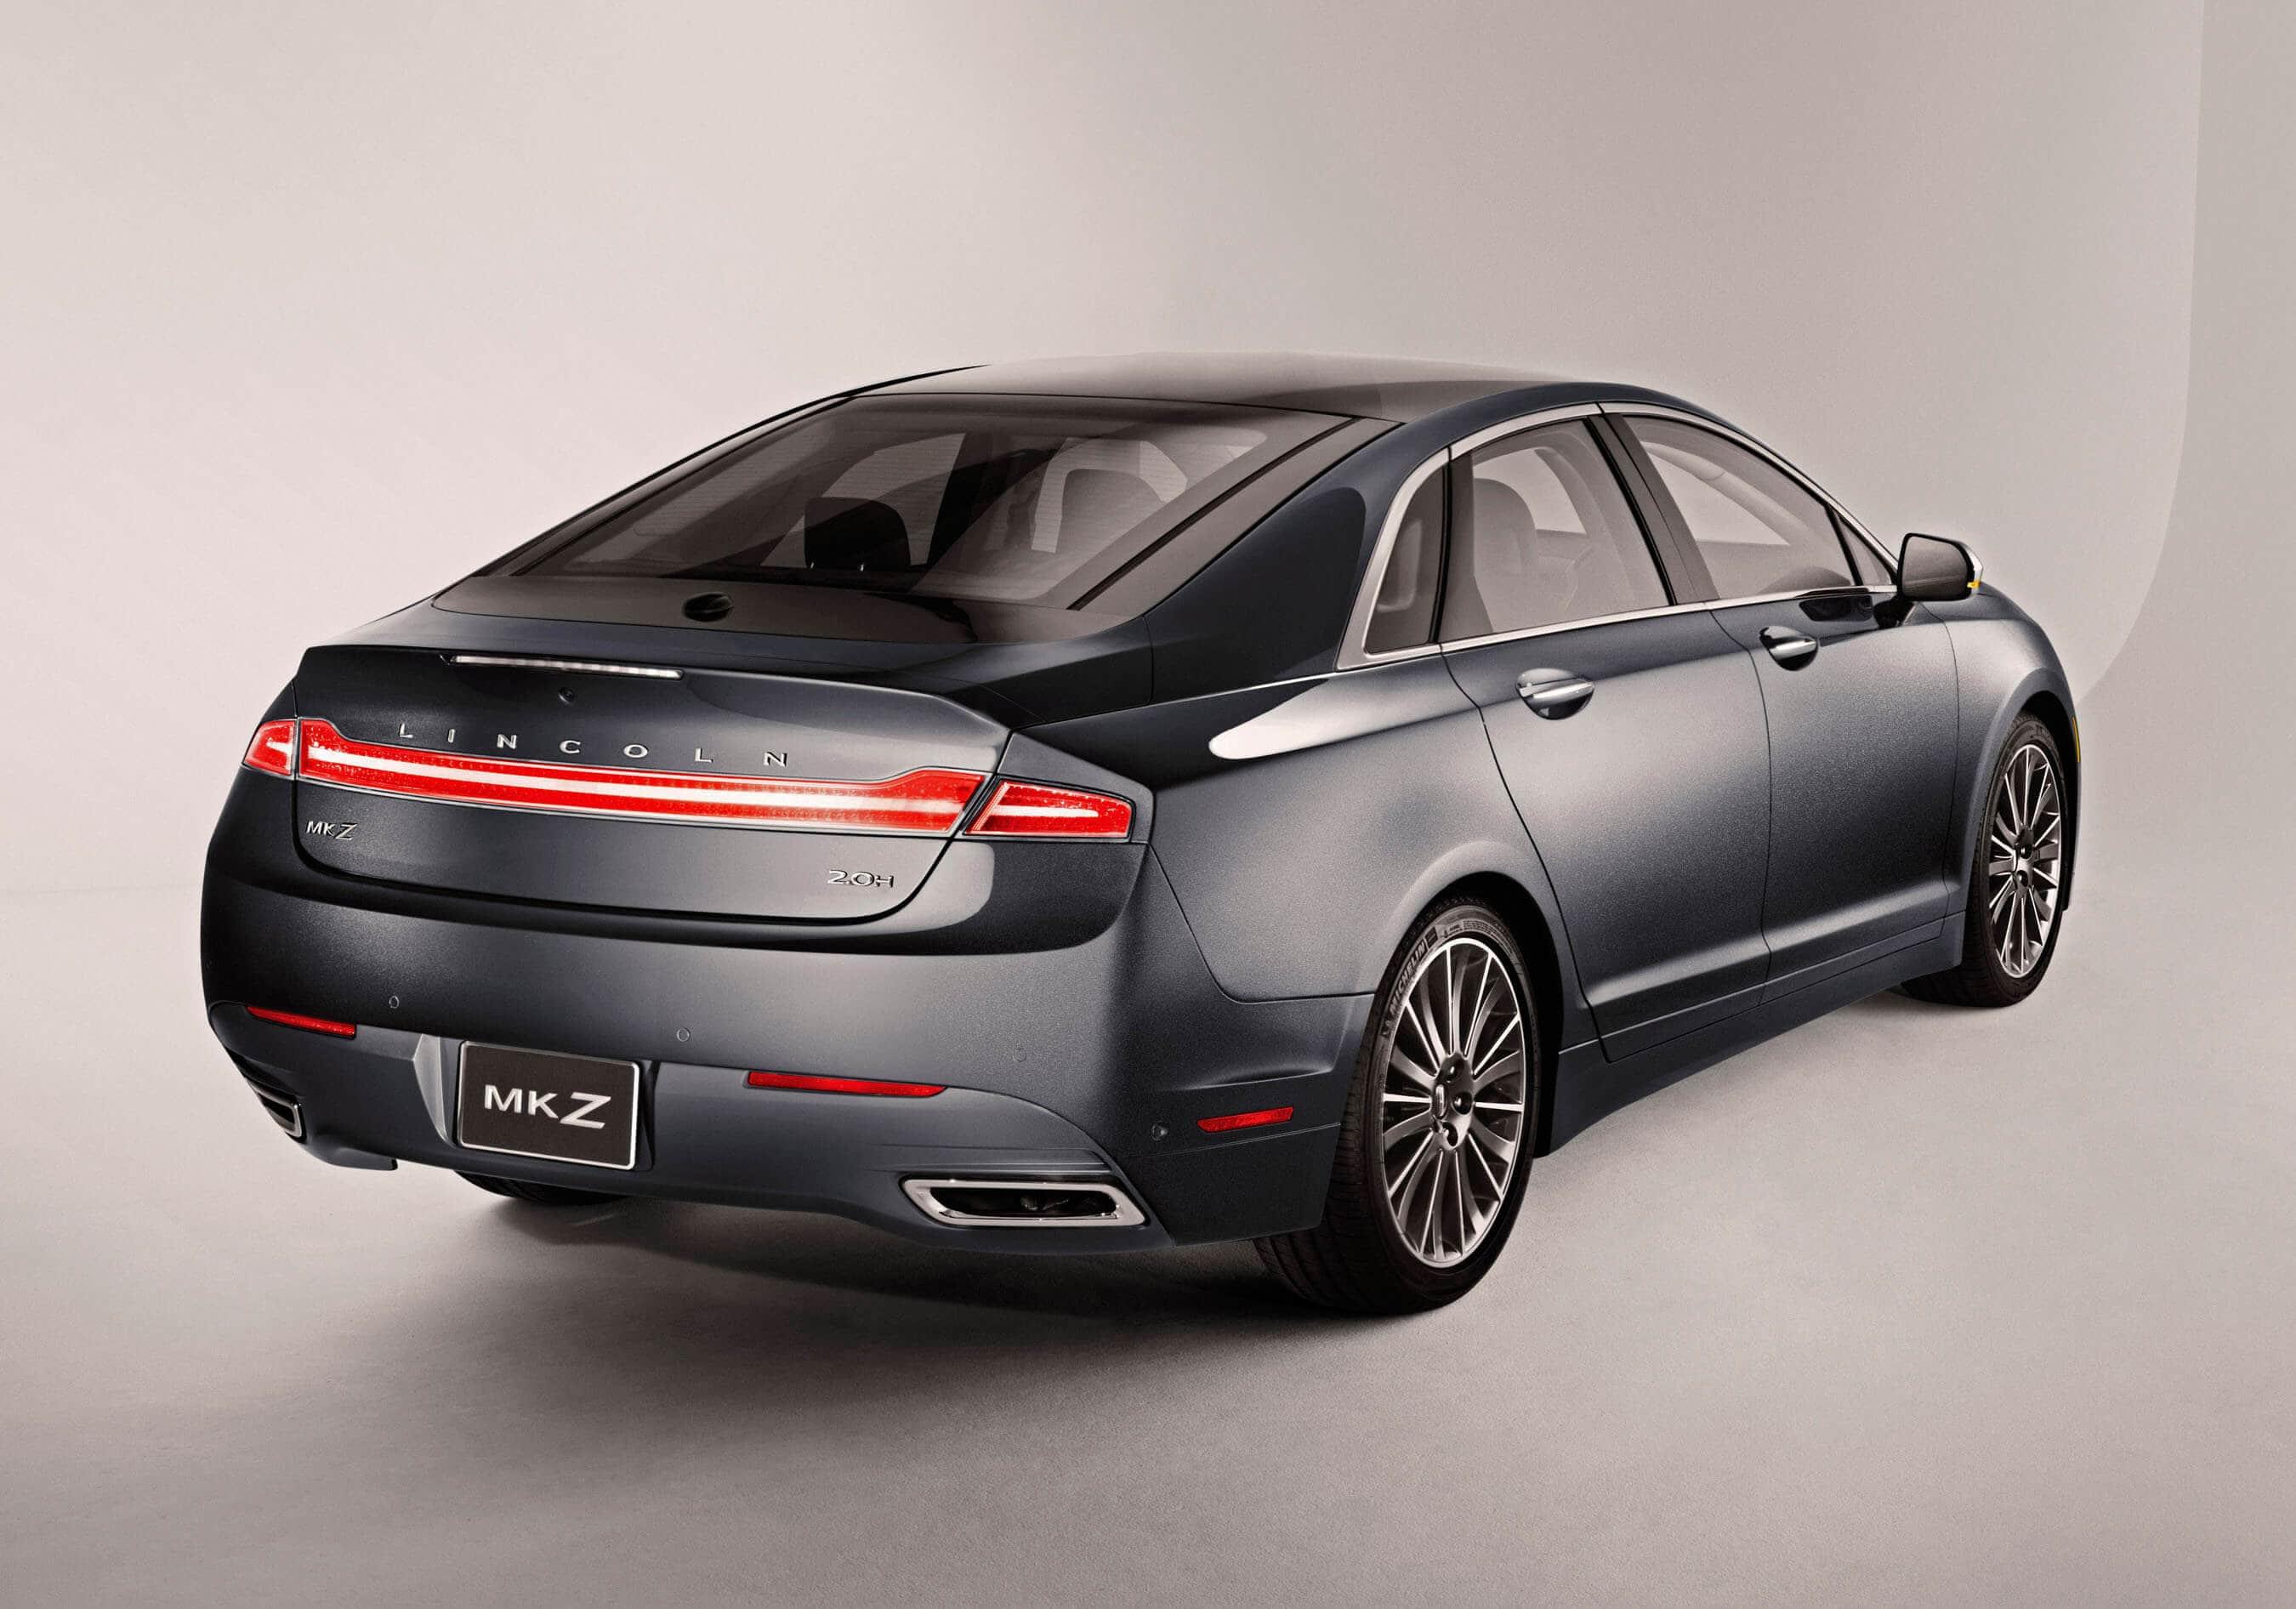 most fuel efficient luxury hybrid car lincoln mkz hybrid greener ideal. Black Bedroom Furniture Sets. Home Design Ideas